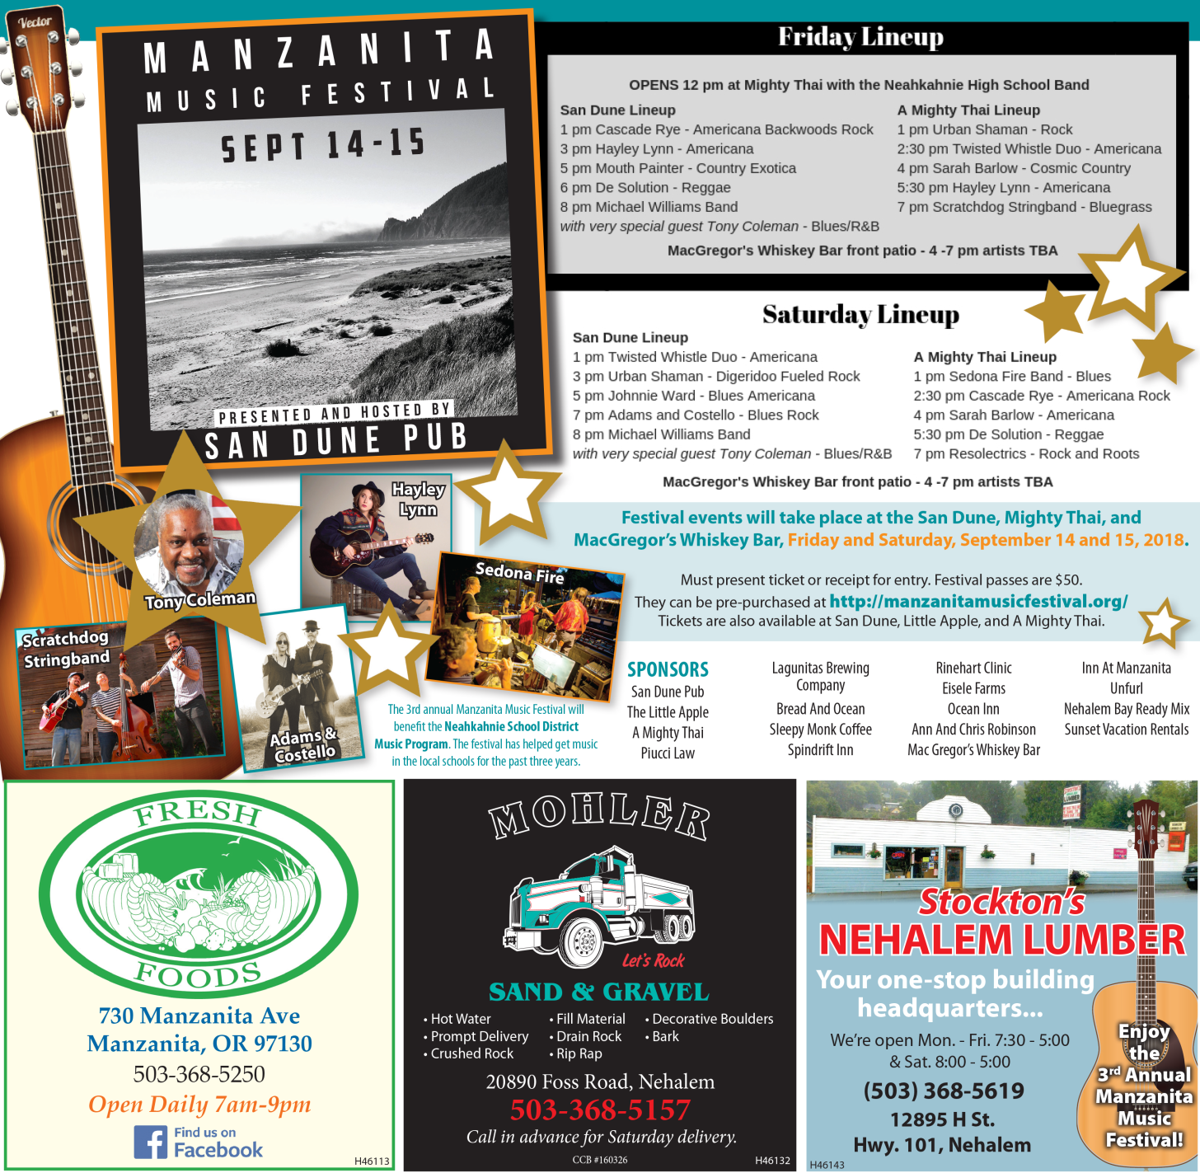 Manzanita Music Fest